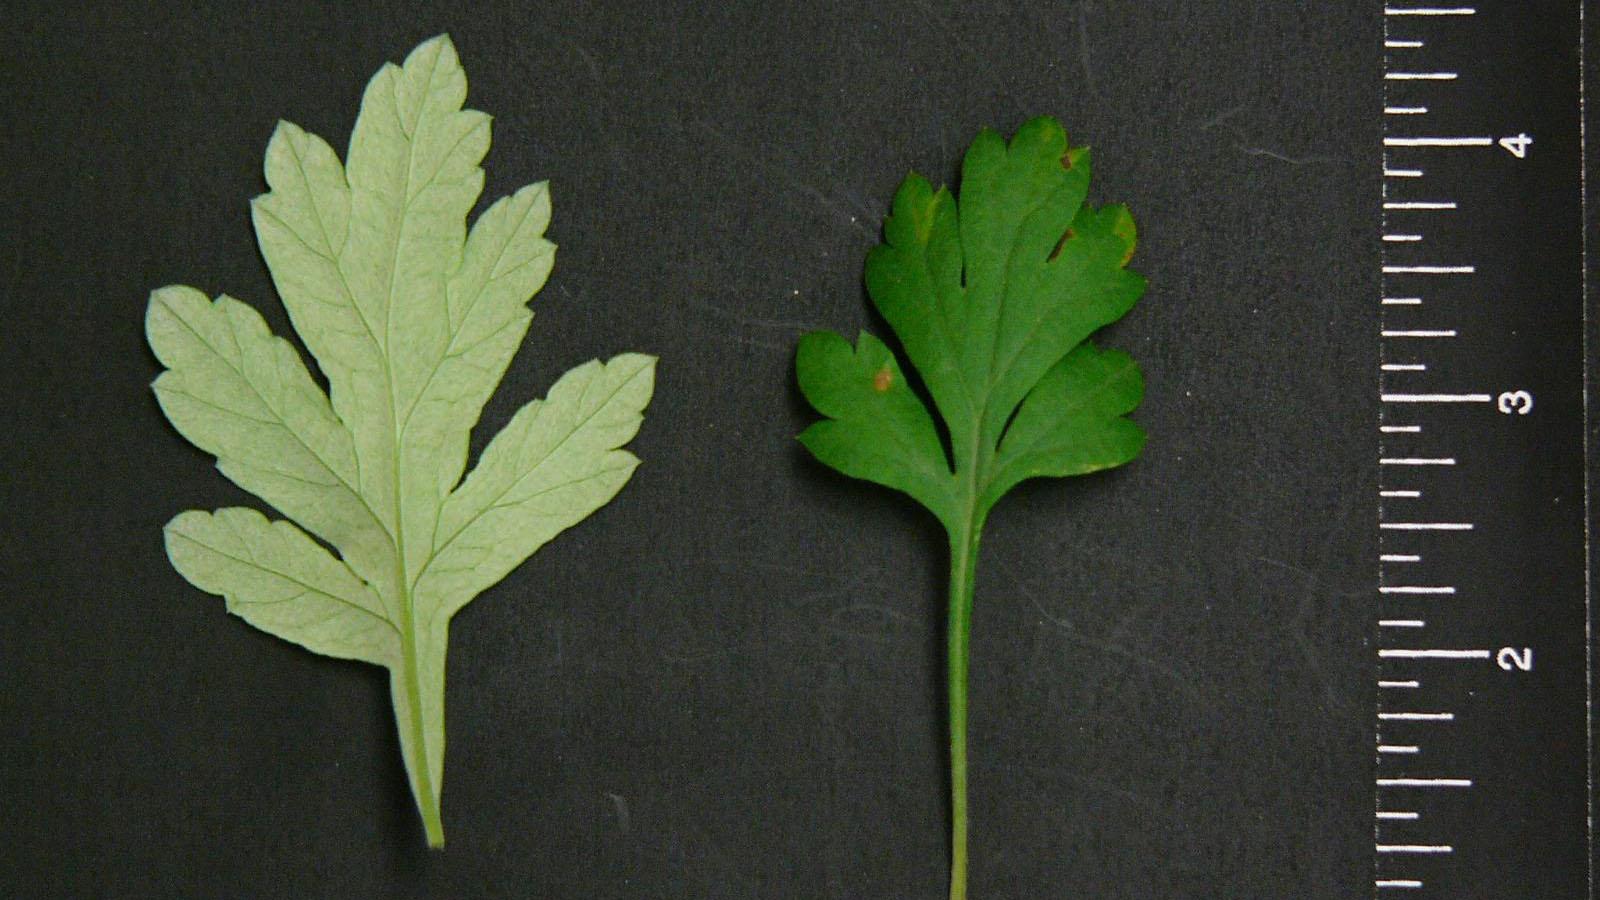 Mugwort leaflet shape.